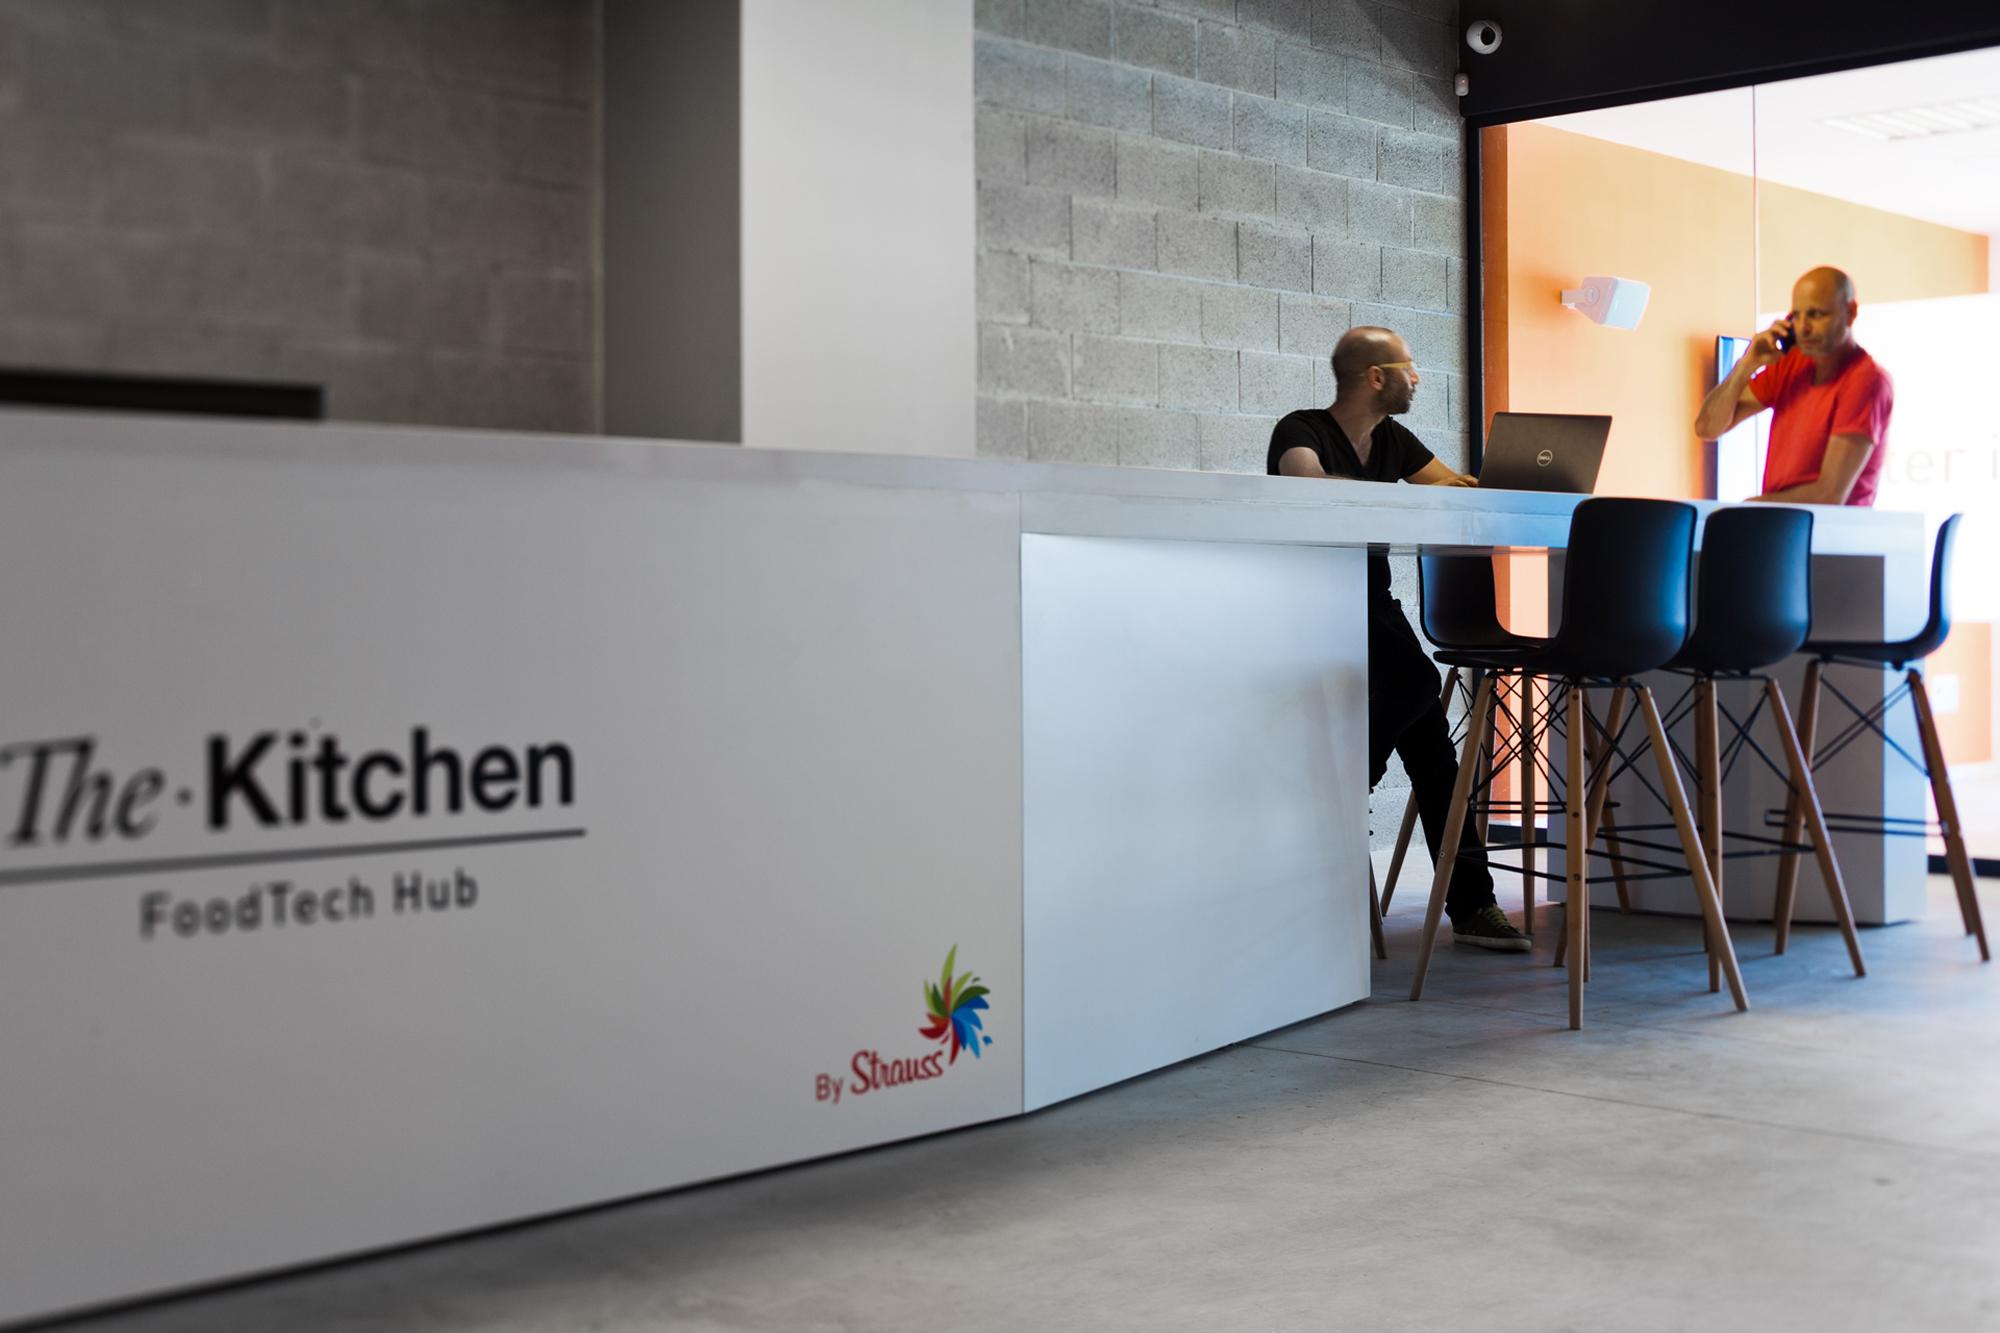 Office Design - FoodTech Hub